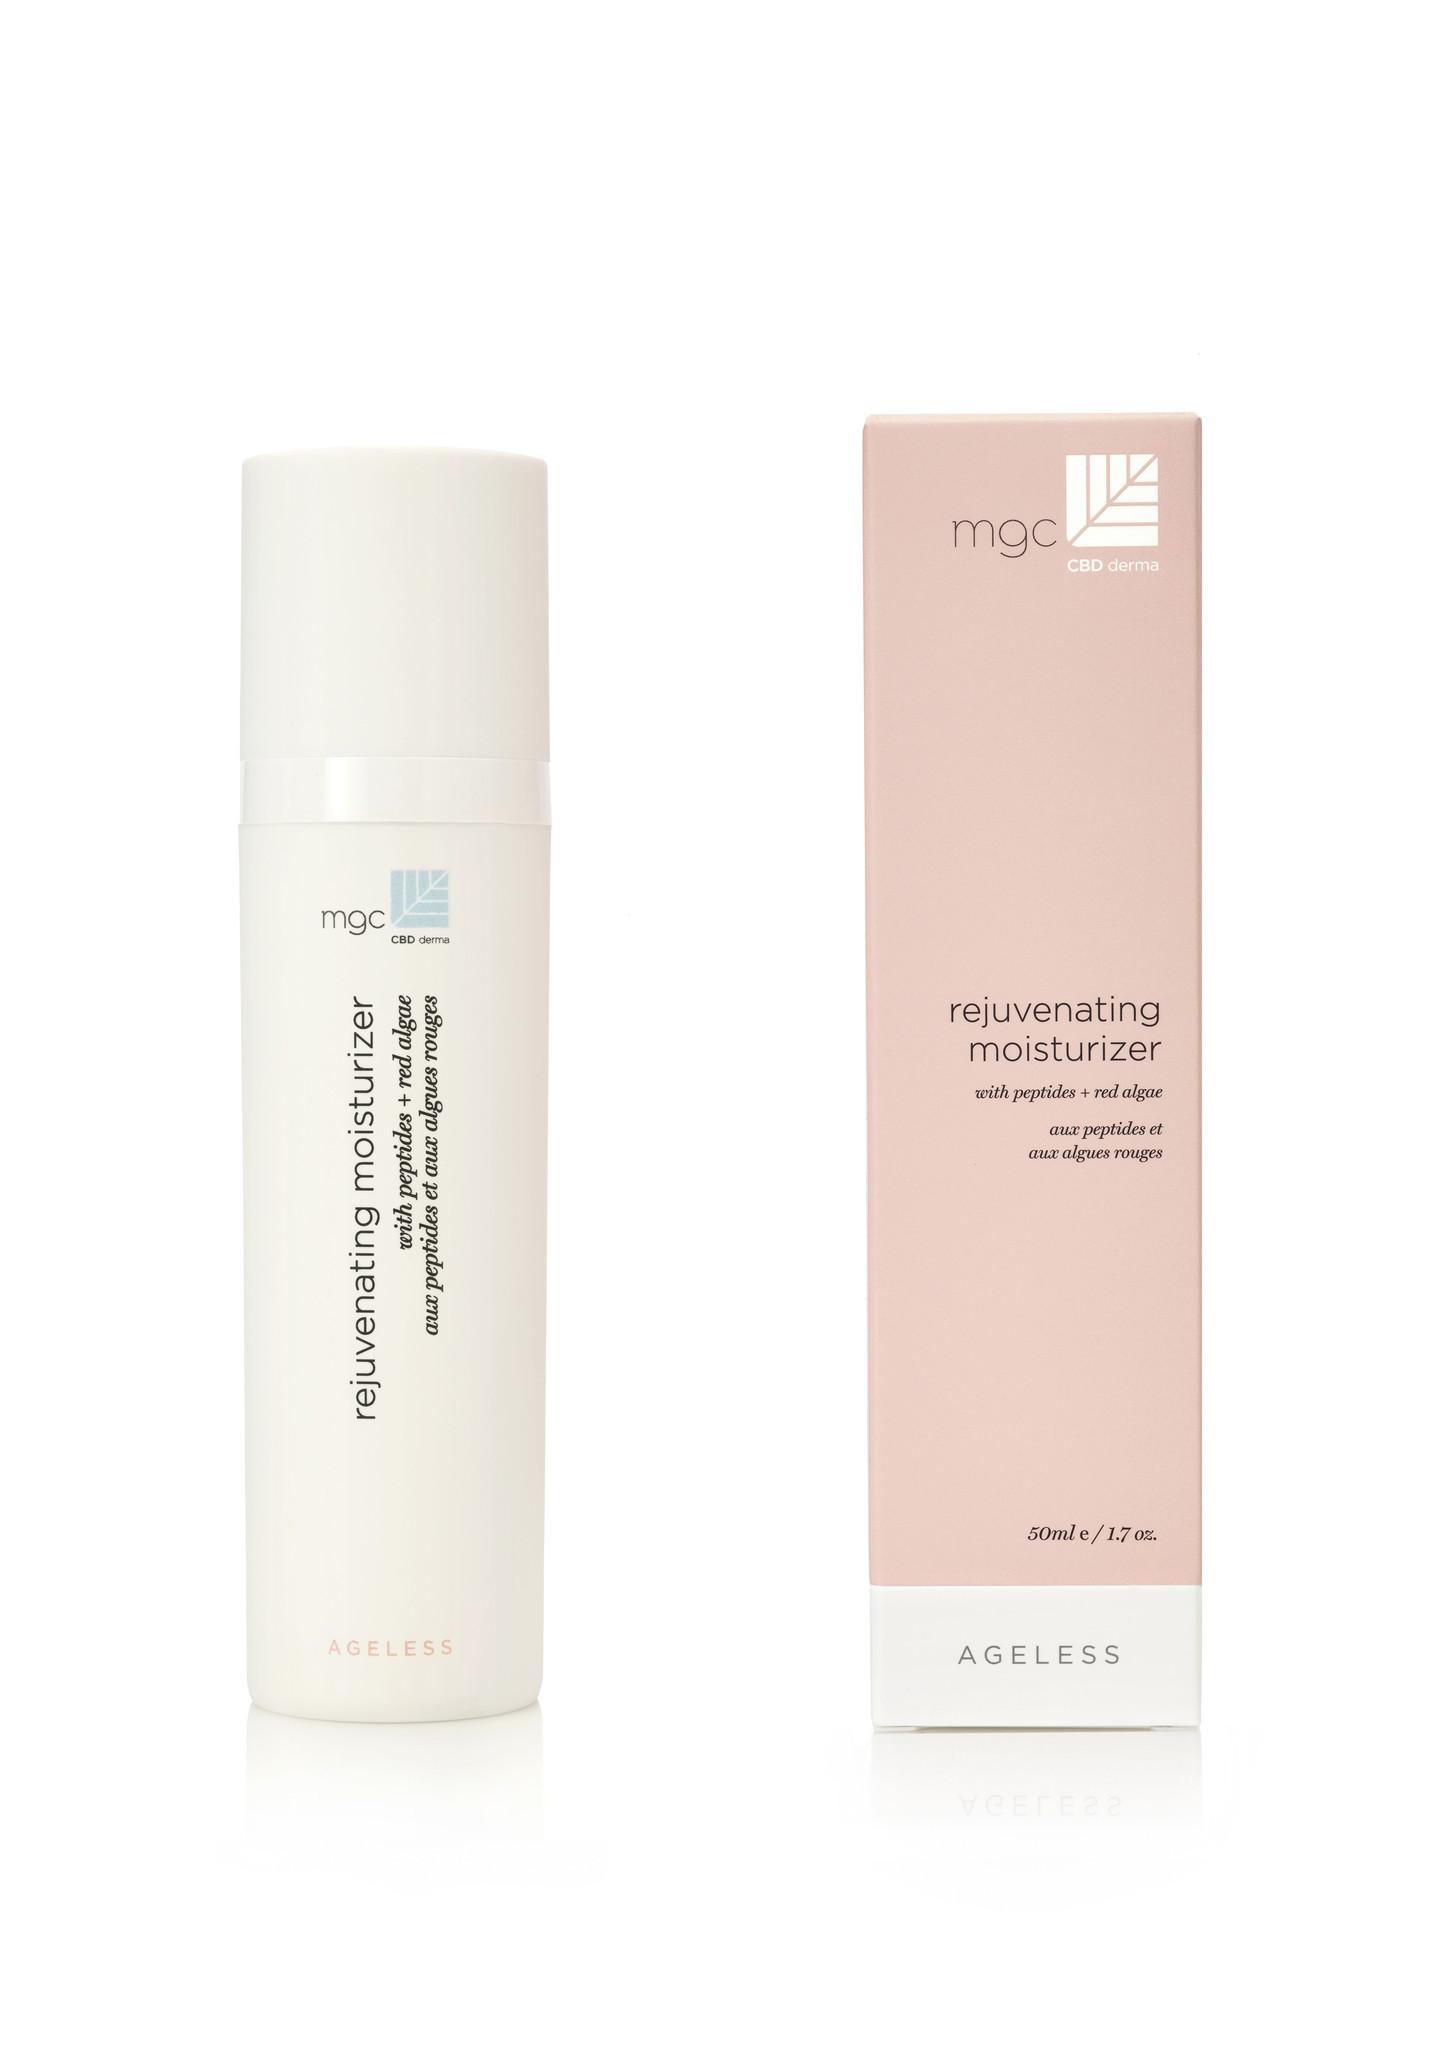 MGC Derma MGC cbd derma-AGELESS rejuvenating moisterizer 50 ml with peptides + red algae Normal / dry skin